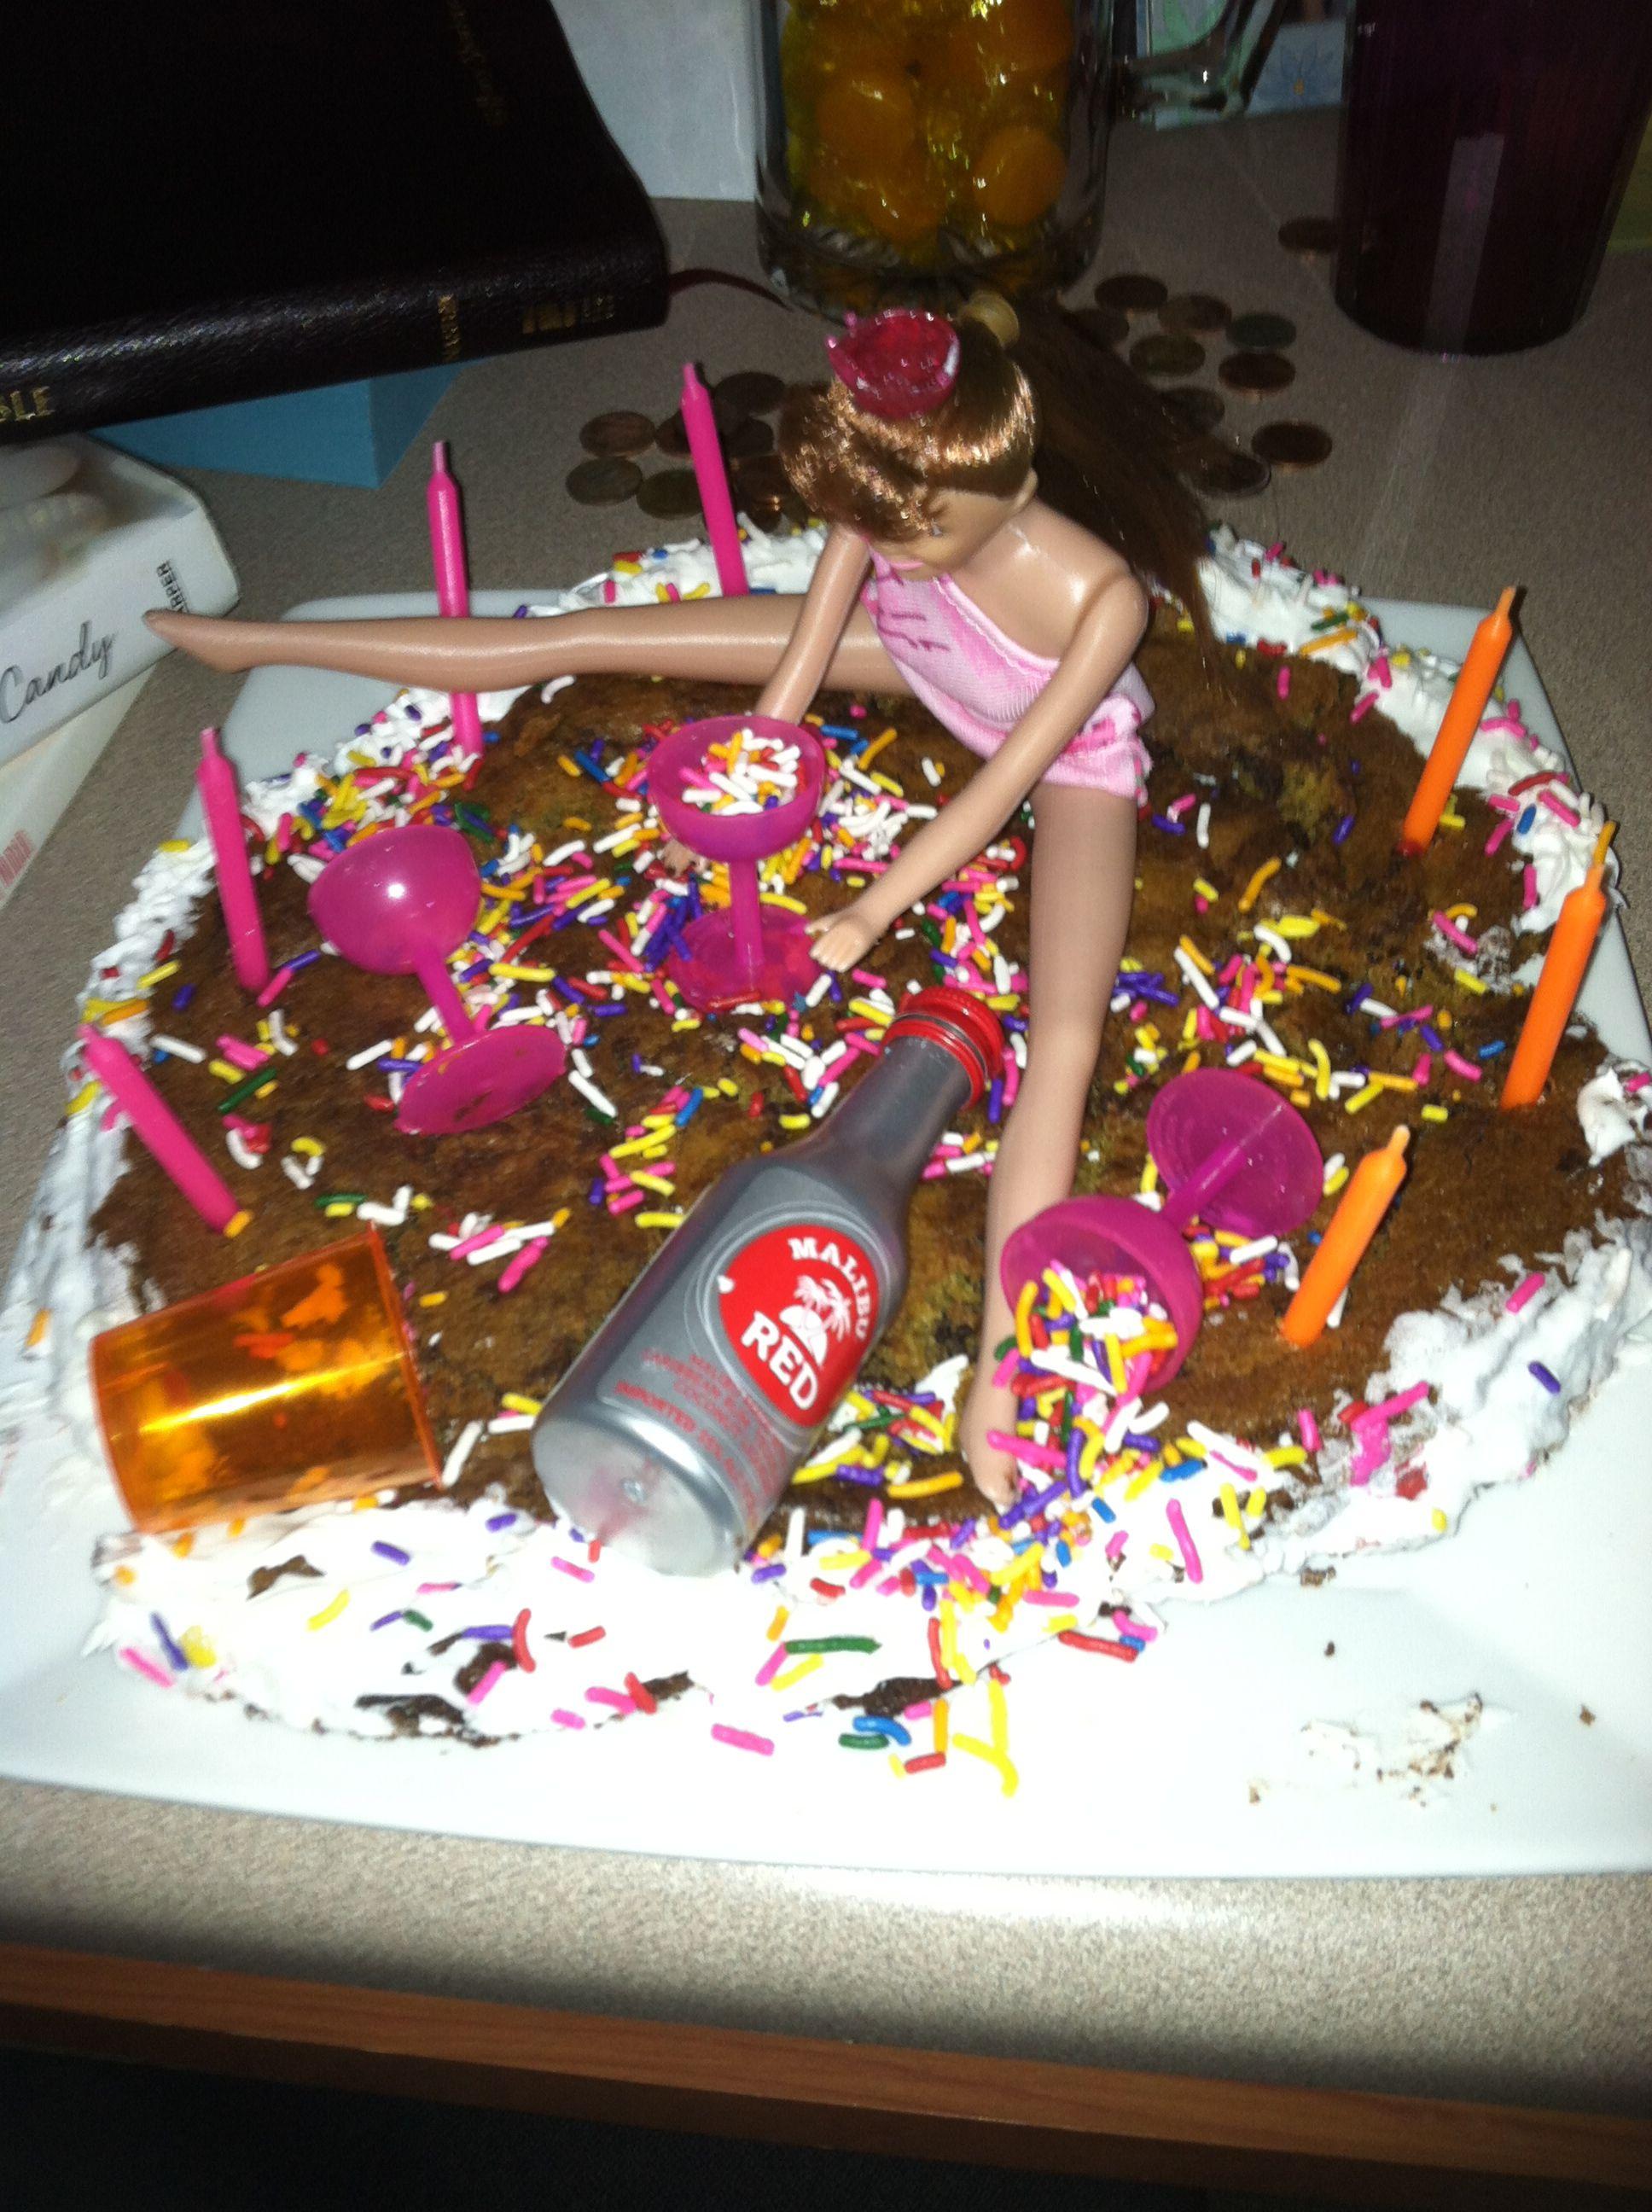 21st Birthday Cake Barbie Malibu Liquor Crazy Cakes Pinterest Malibu Liquor